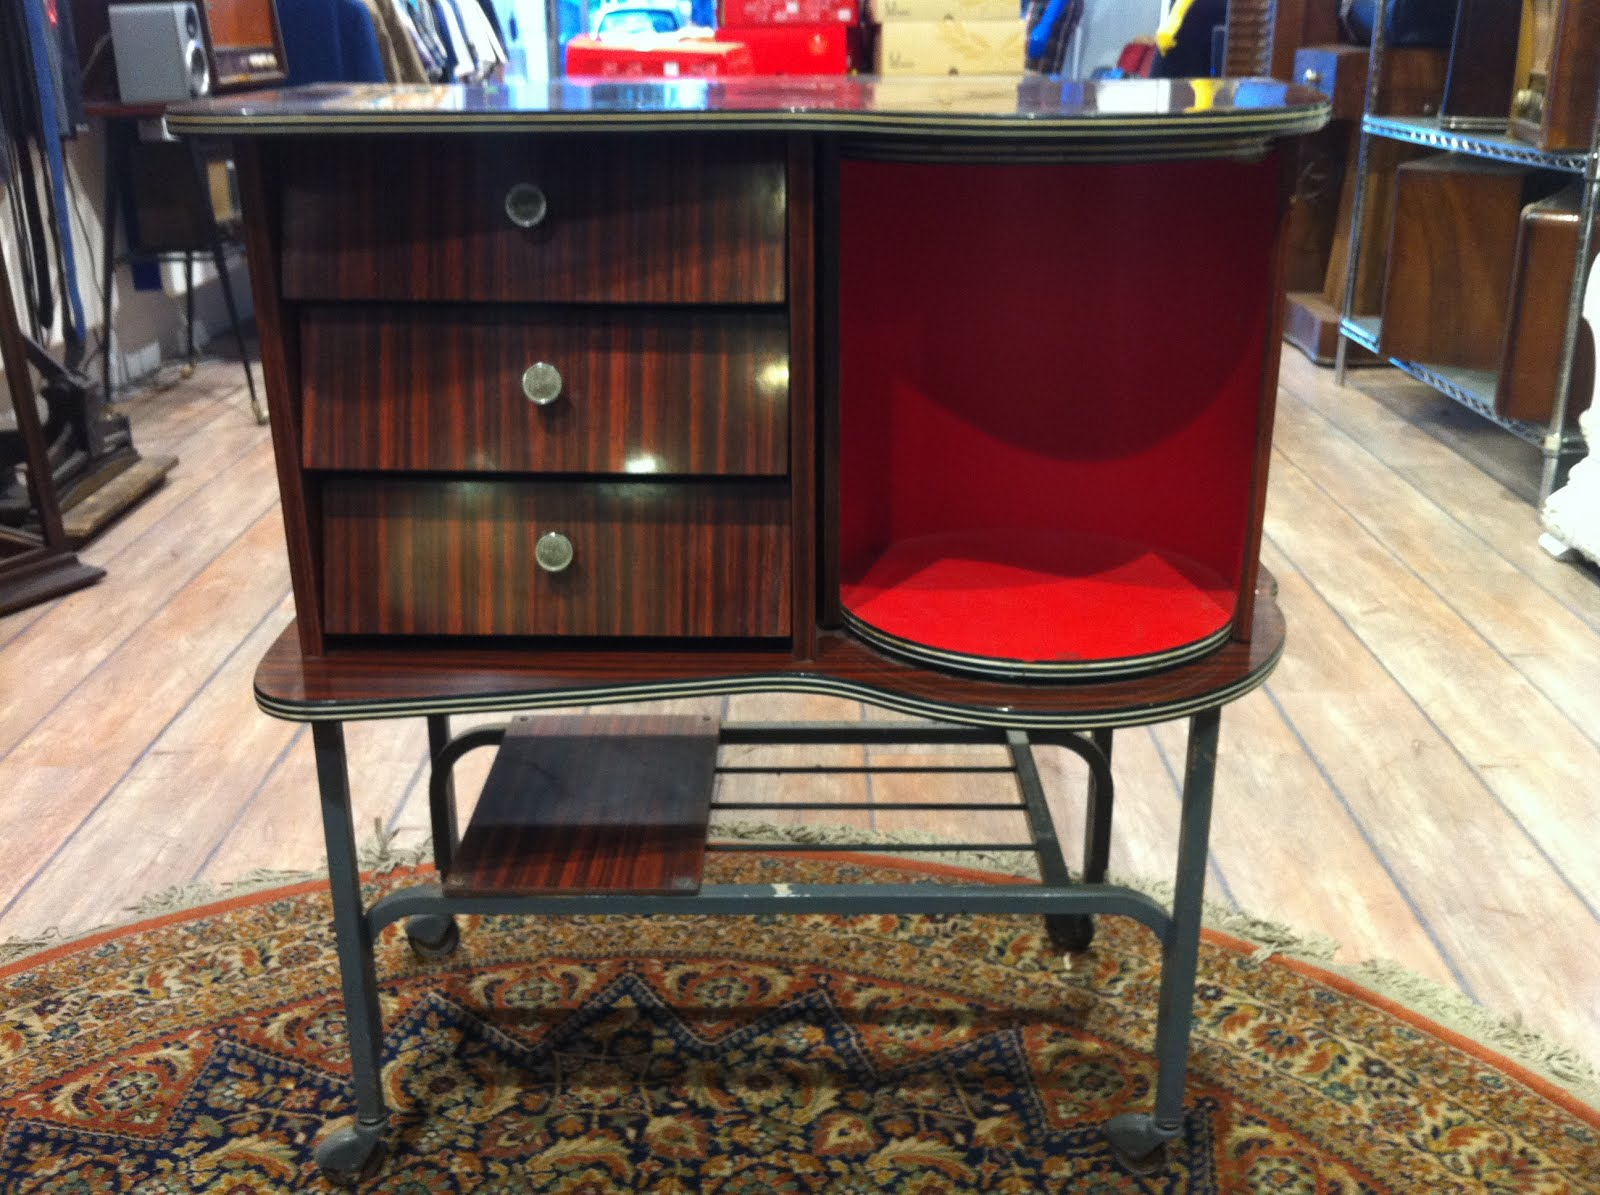 Decoraci n vintage antiguitats baraturantic mueble bar - Muebles anos 60 ...